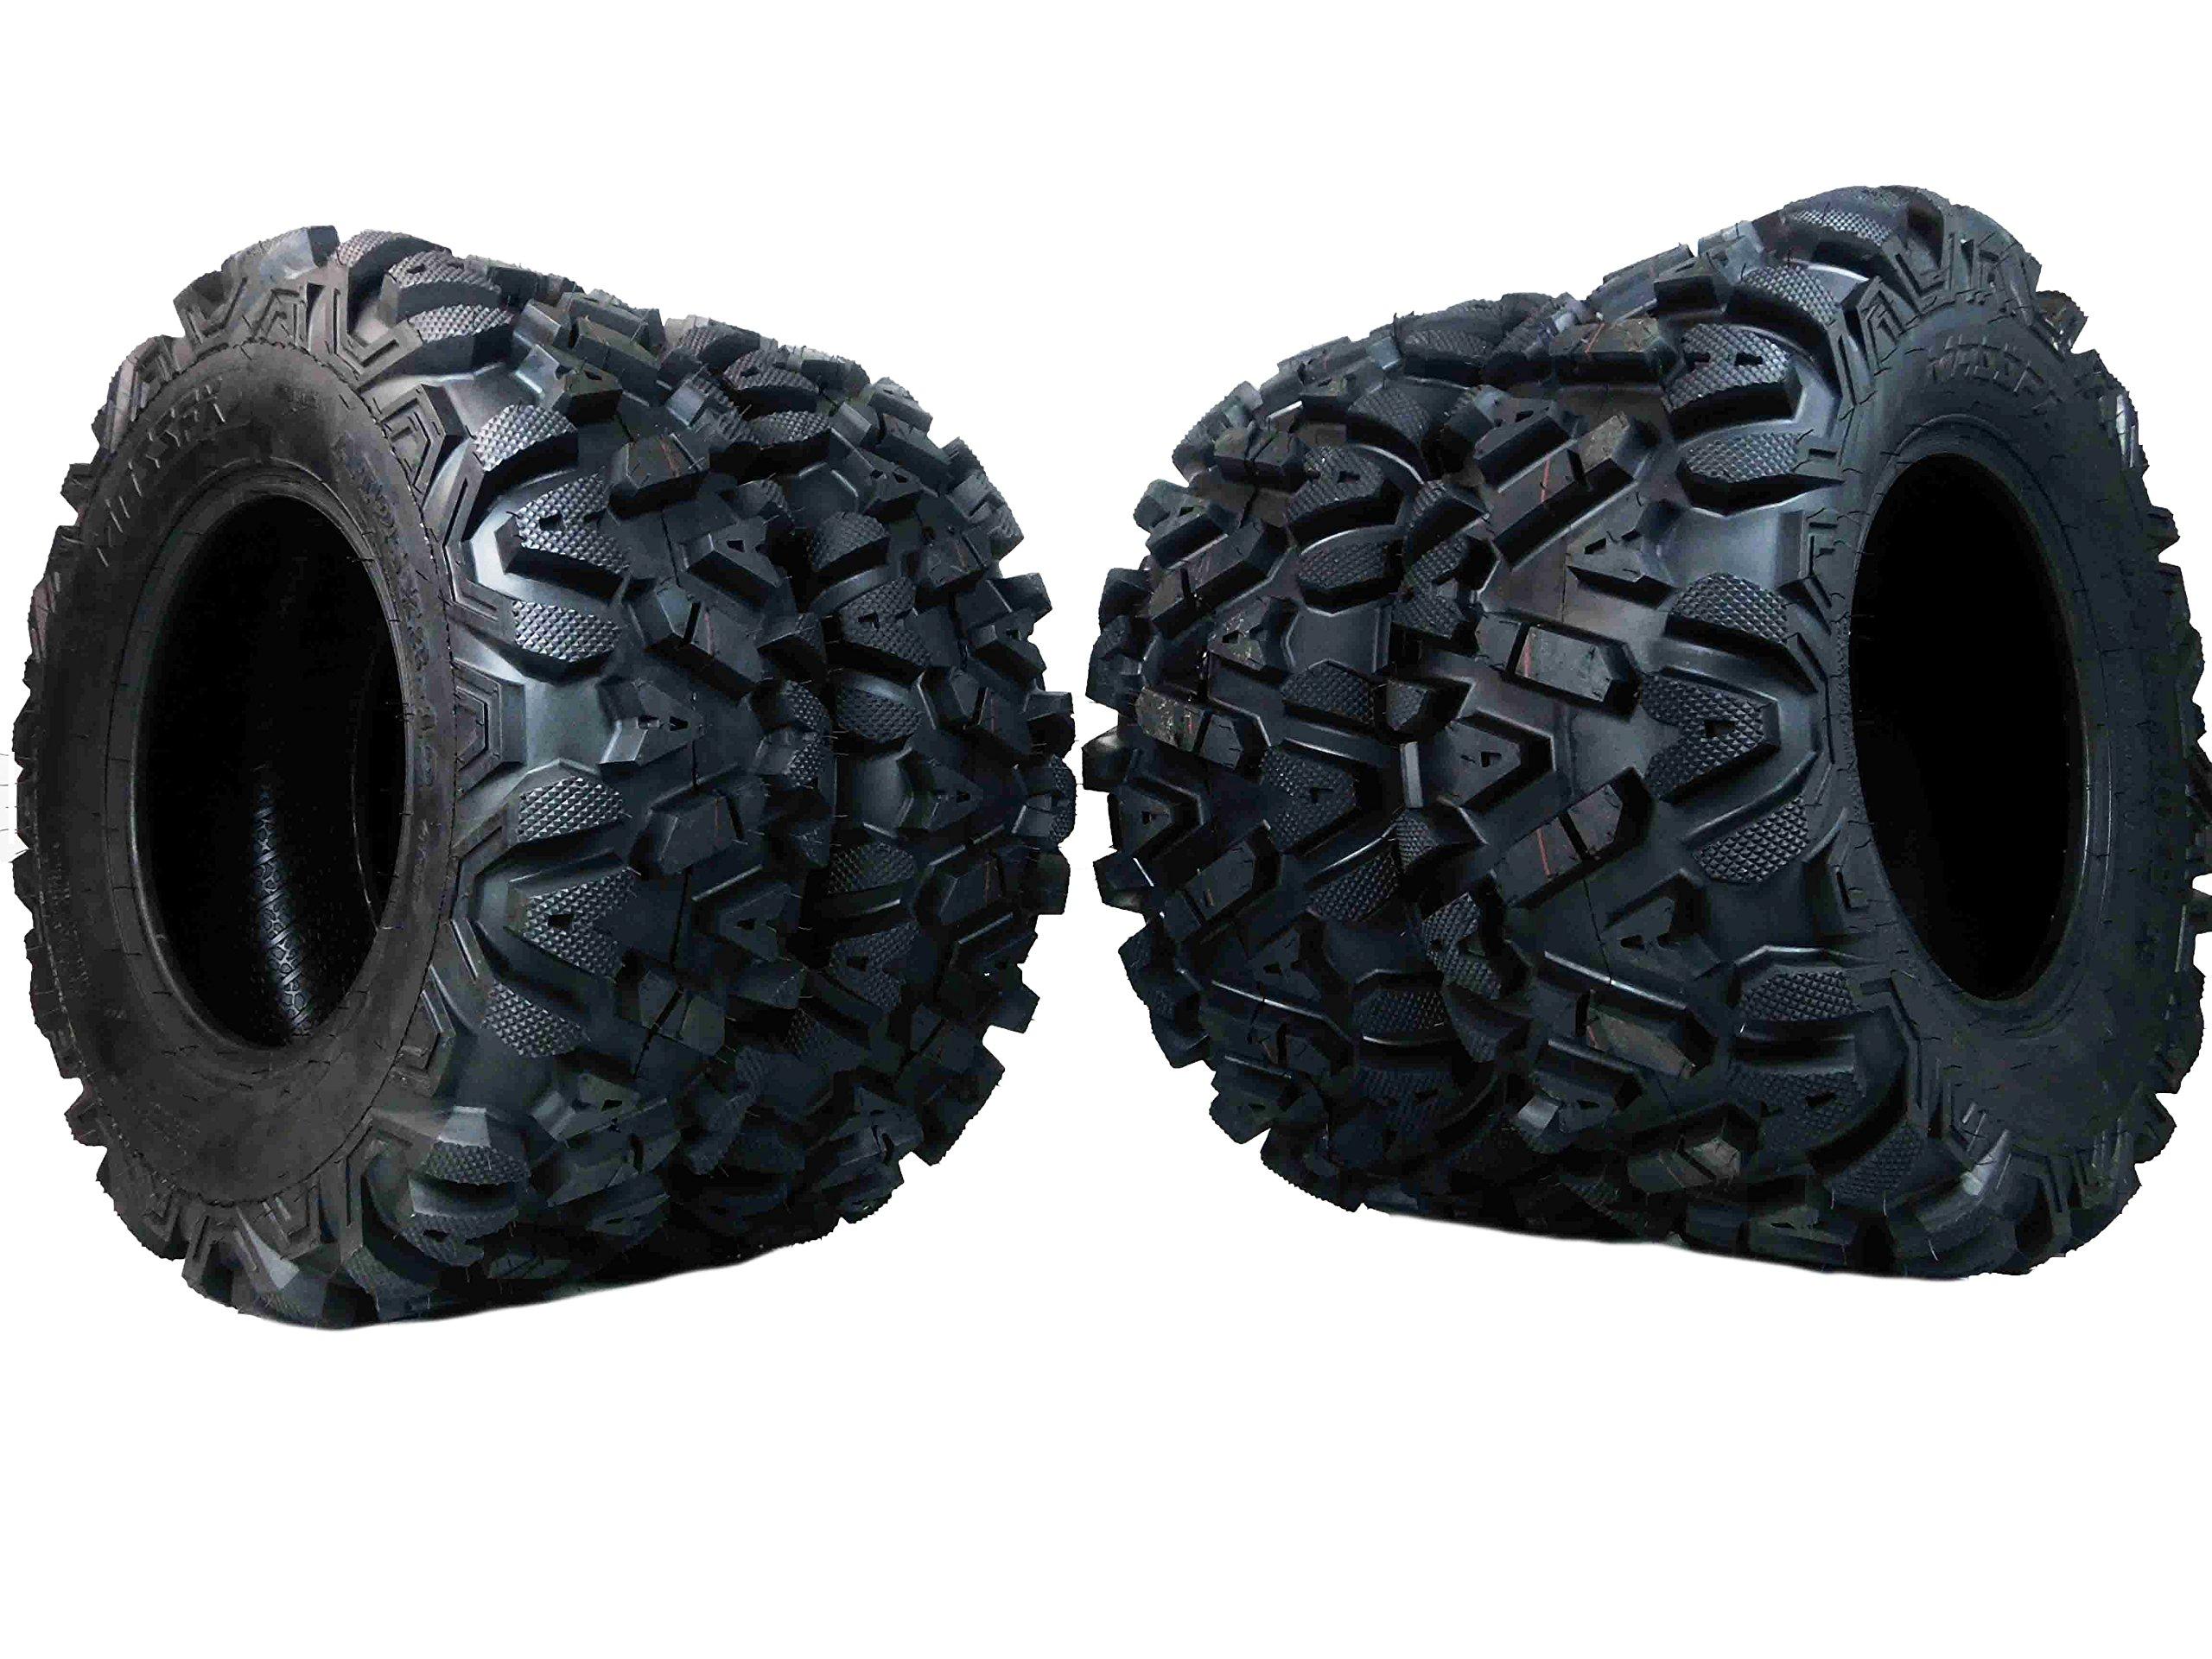 4 New 25x8-12 25x10-12 KT MASSFX TIRE SET ATV TIRES 6 PLY 25'' 25x8x12 25x10x12 by MASSFX (Image #1)